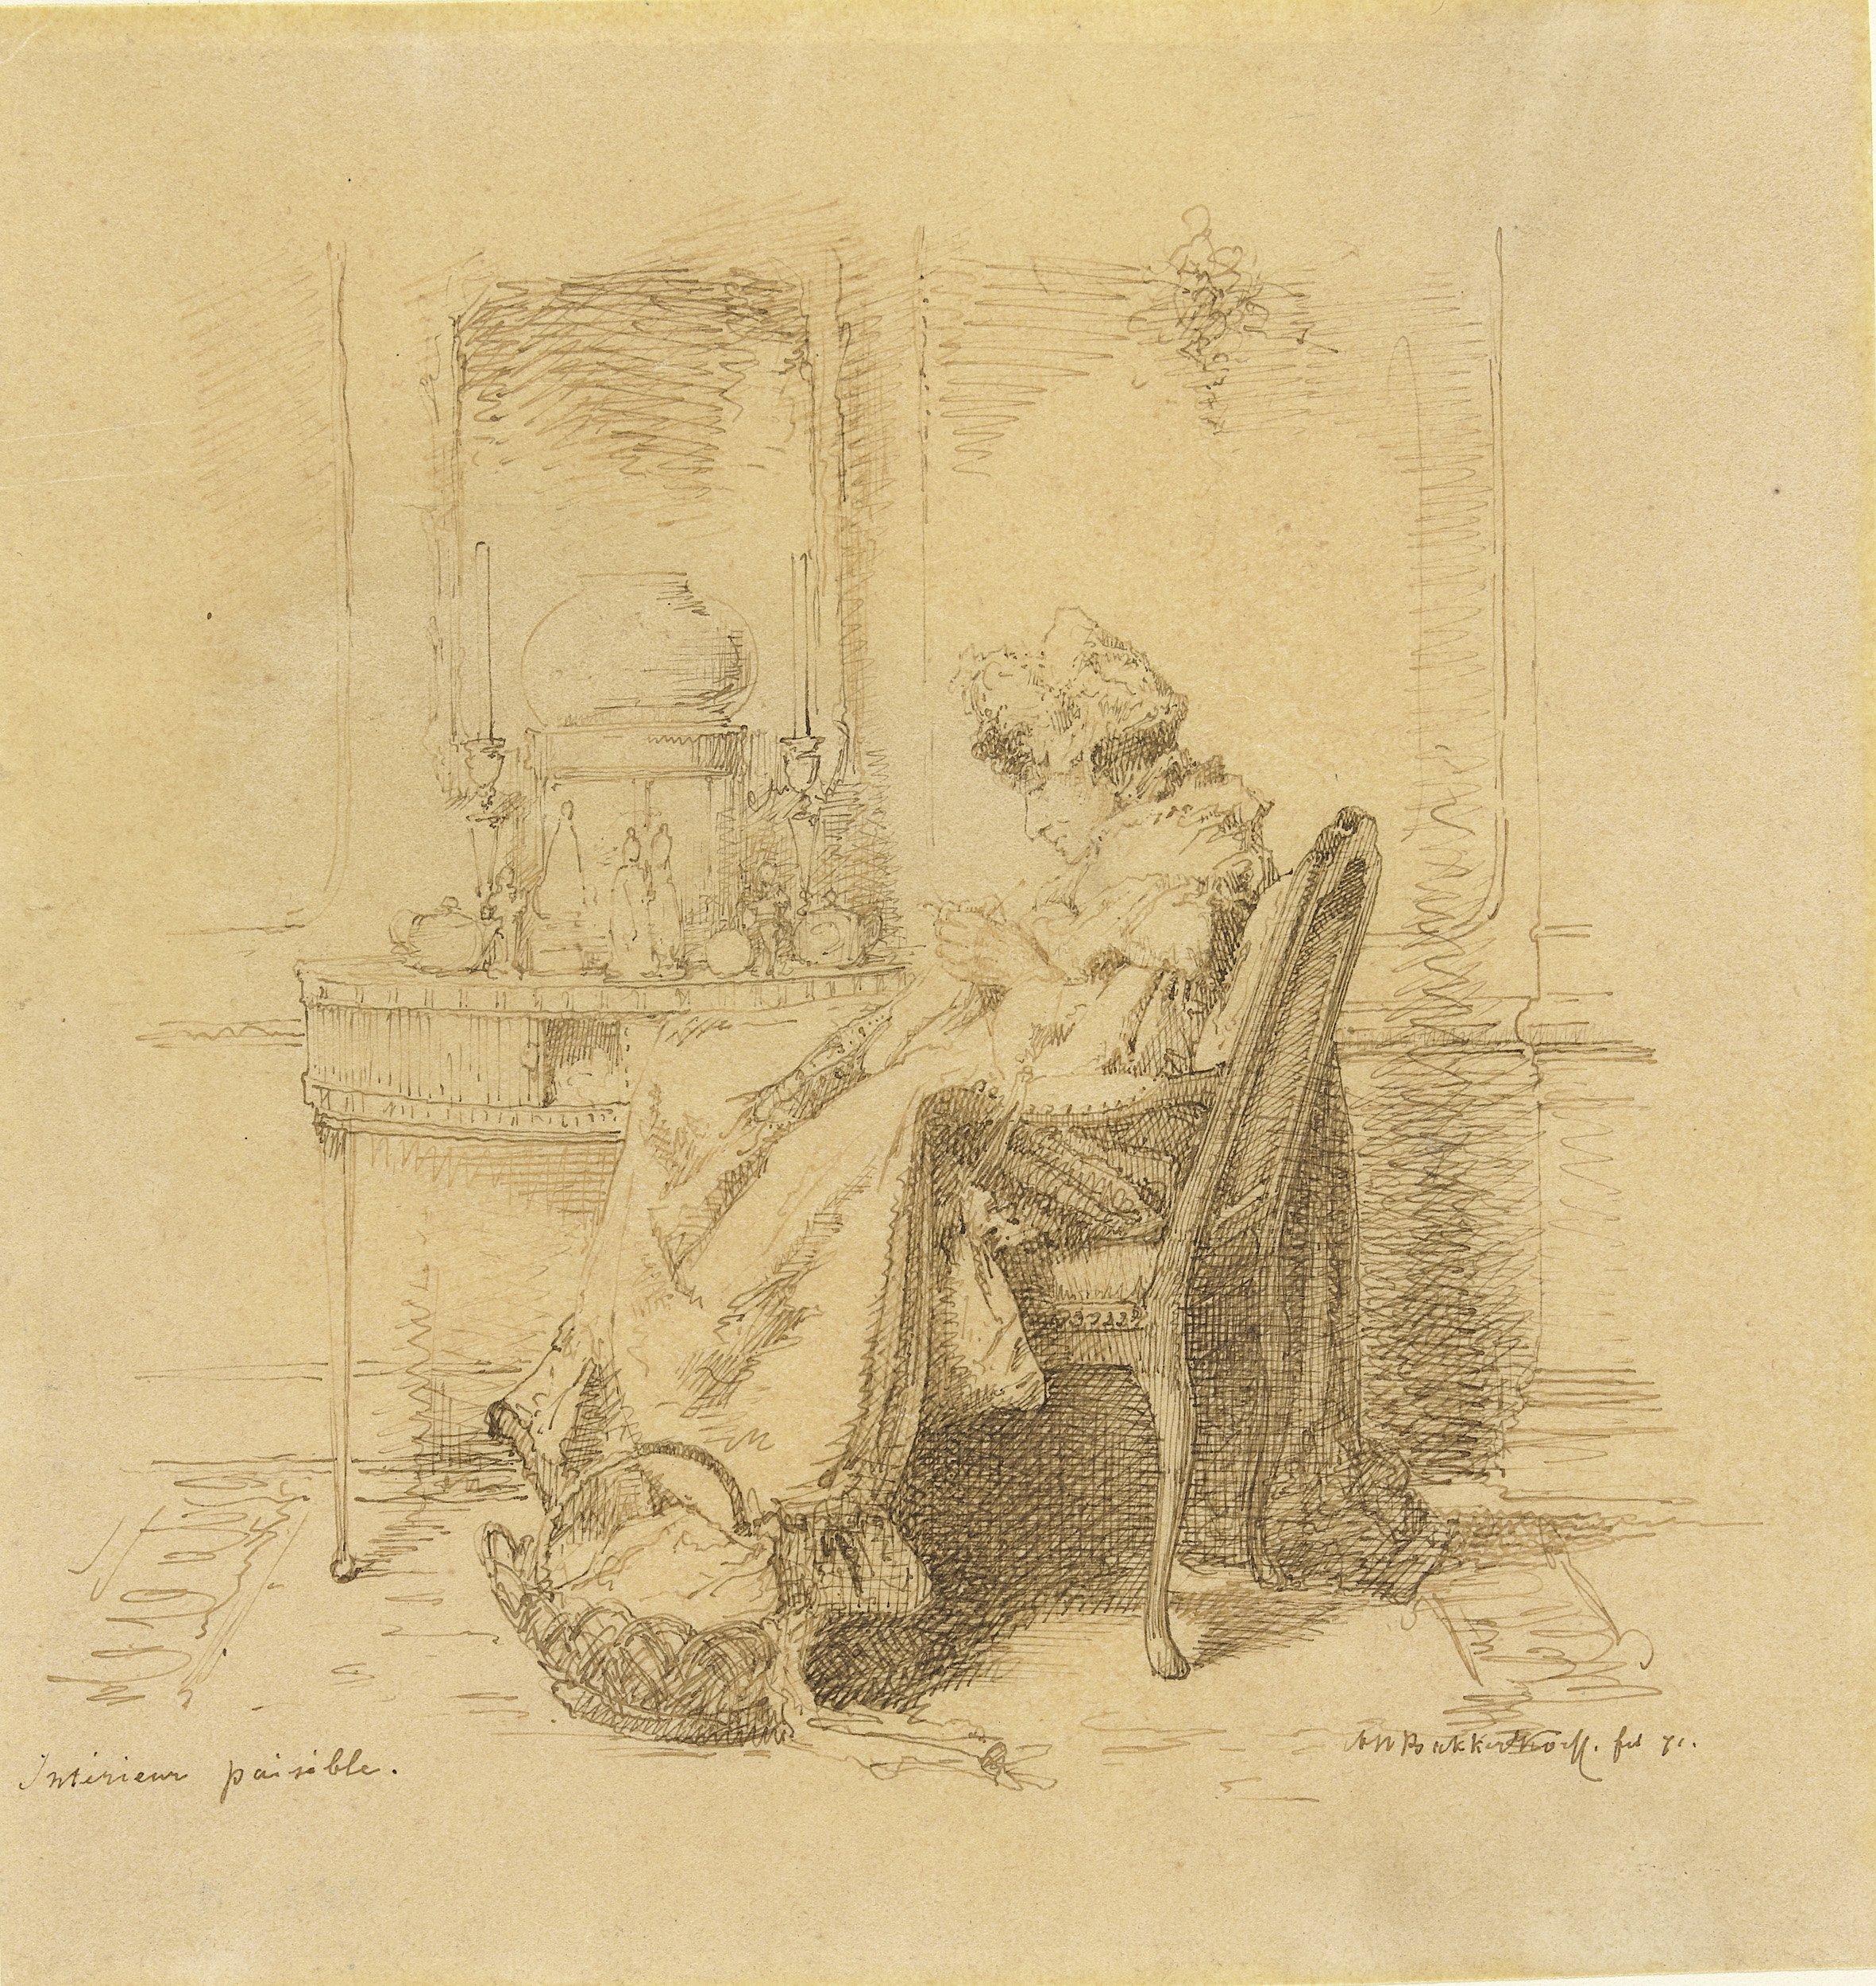 https://upload.wikimedia.org/wikipedia/commons/a/af/Alexander_Hugo_Bakker_Korff_-_Interieur_paisible%2C_breiende_oude_dame.jpg